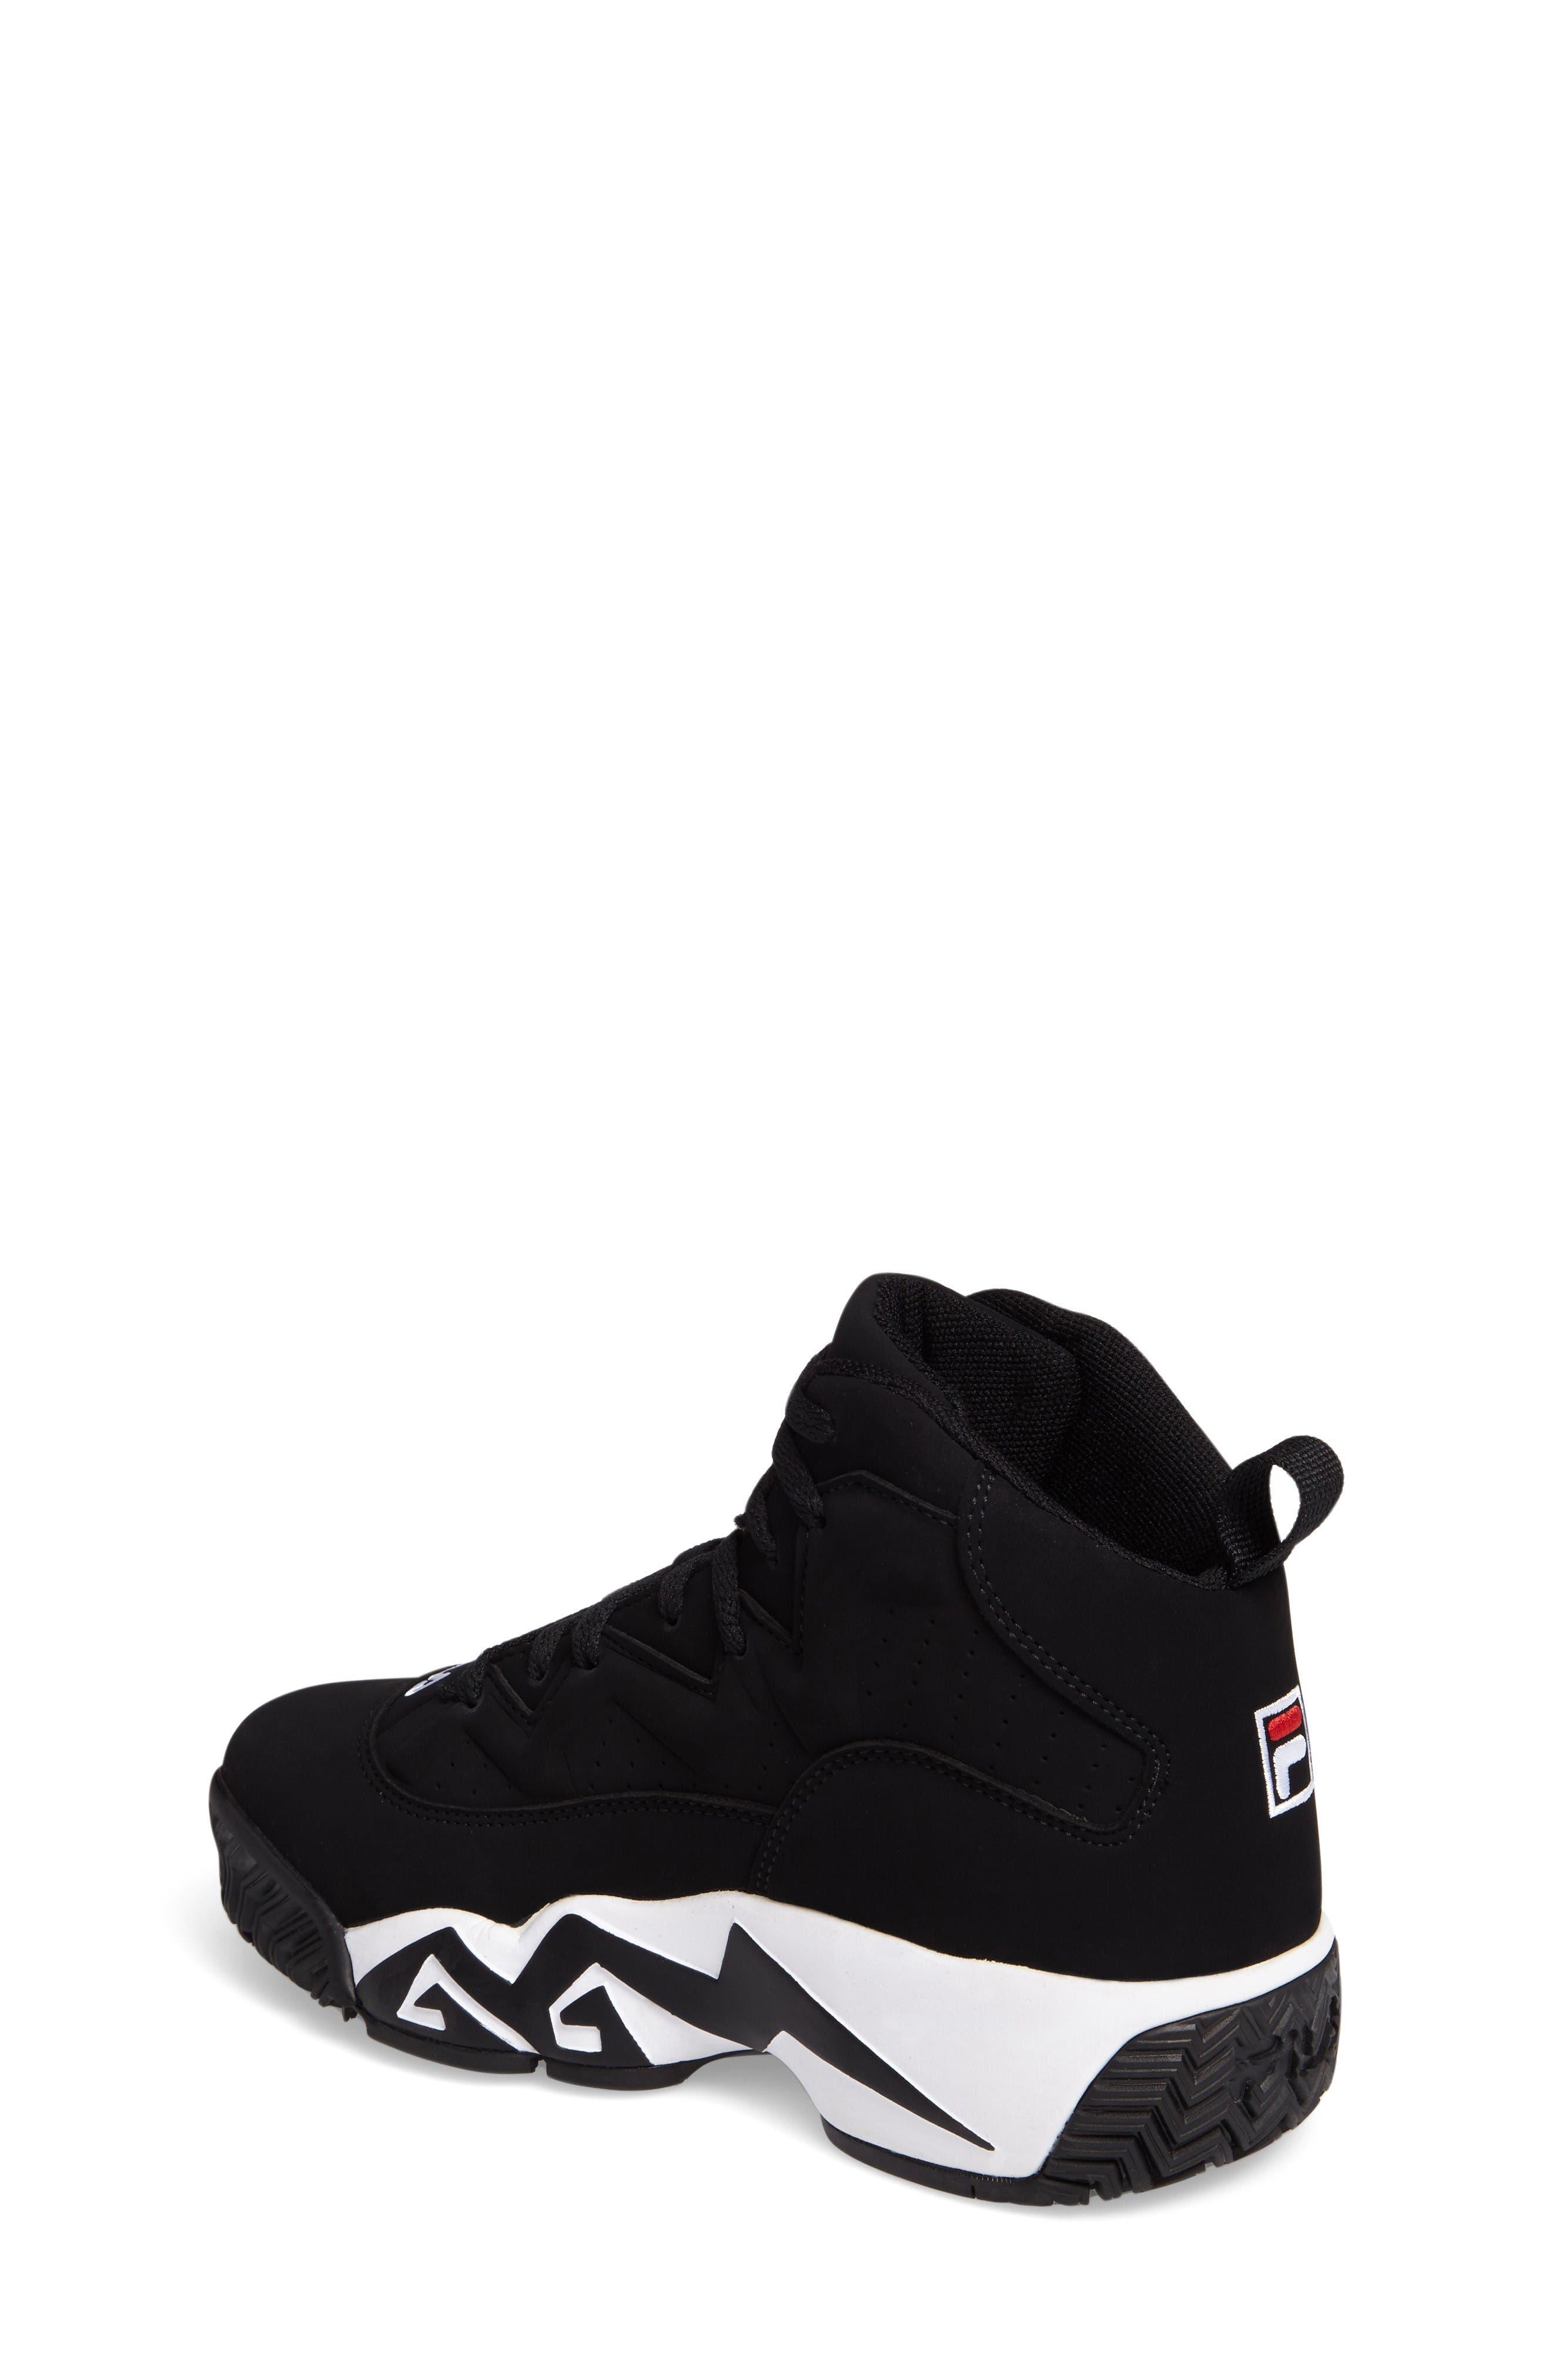 Heritage Sneaker,                             Alternate thumbnail 2, color,                             Black/ White Nubuck Leather